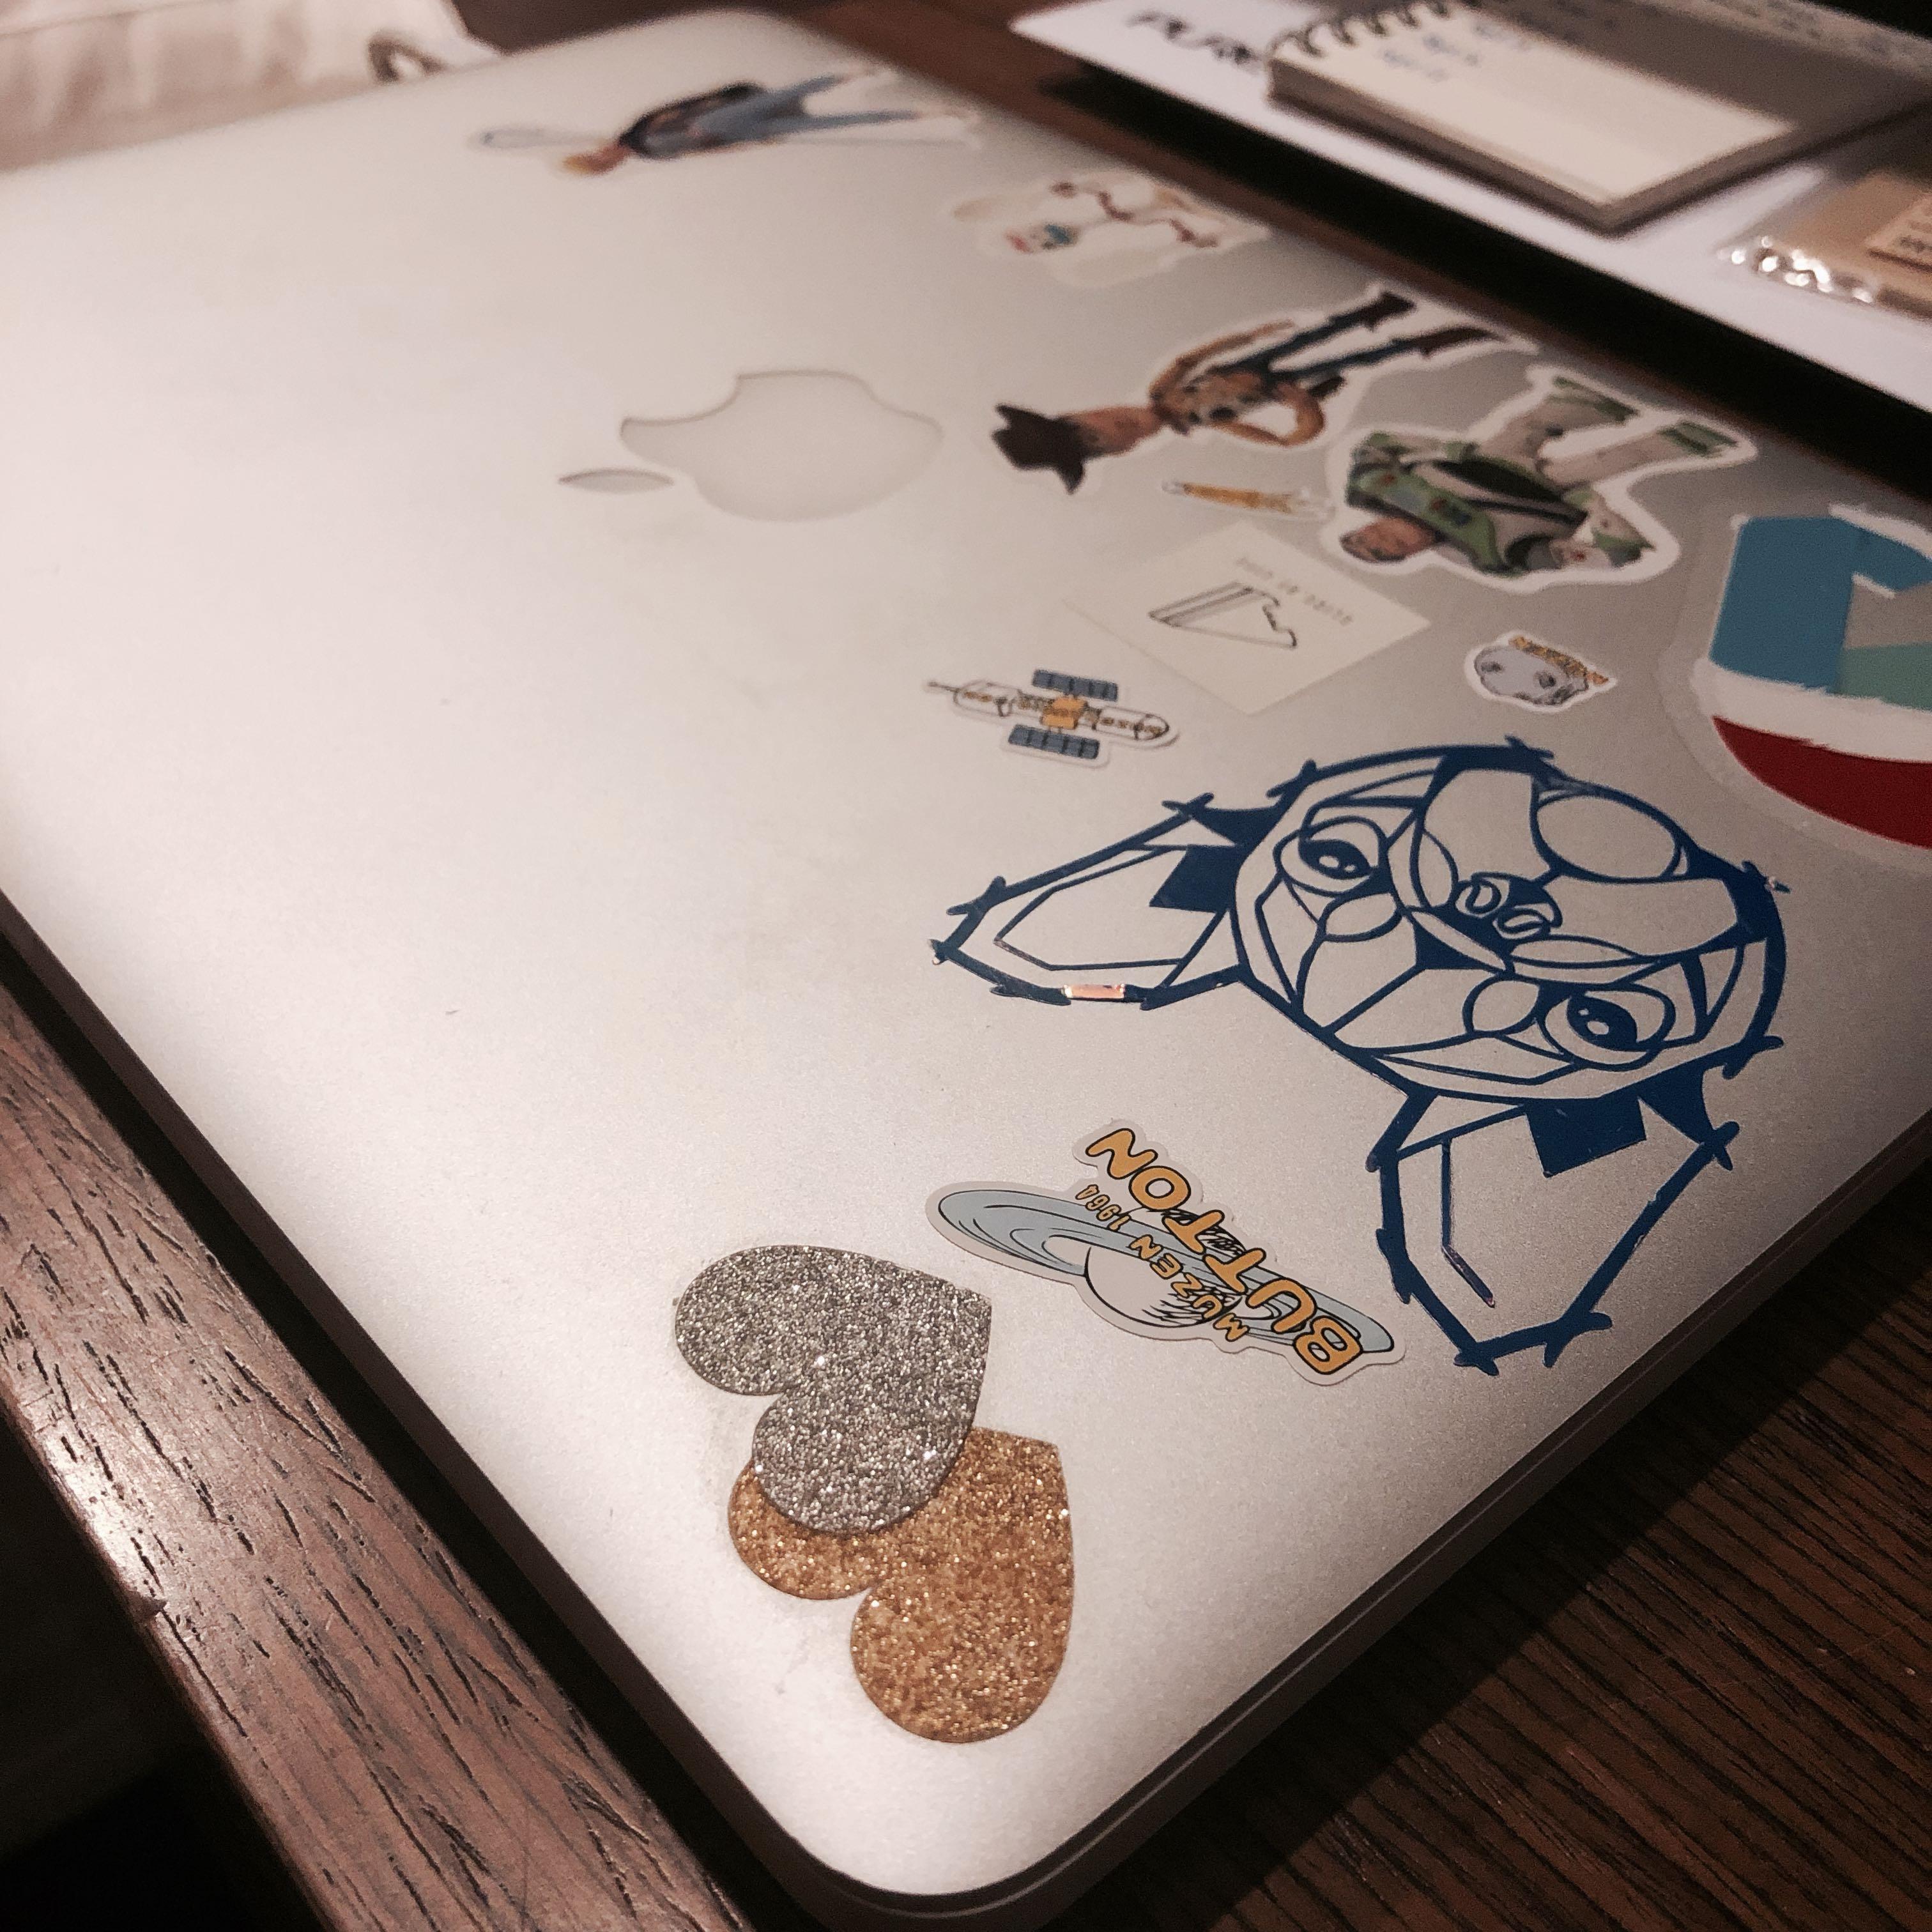 MacBook Pro (Retina, 13 inch)